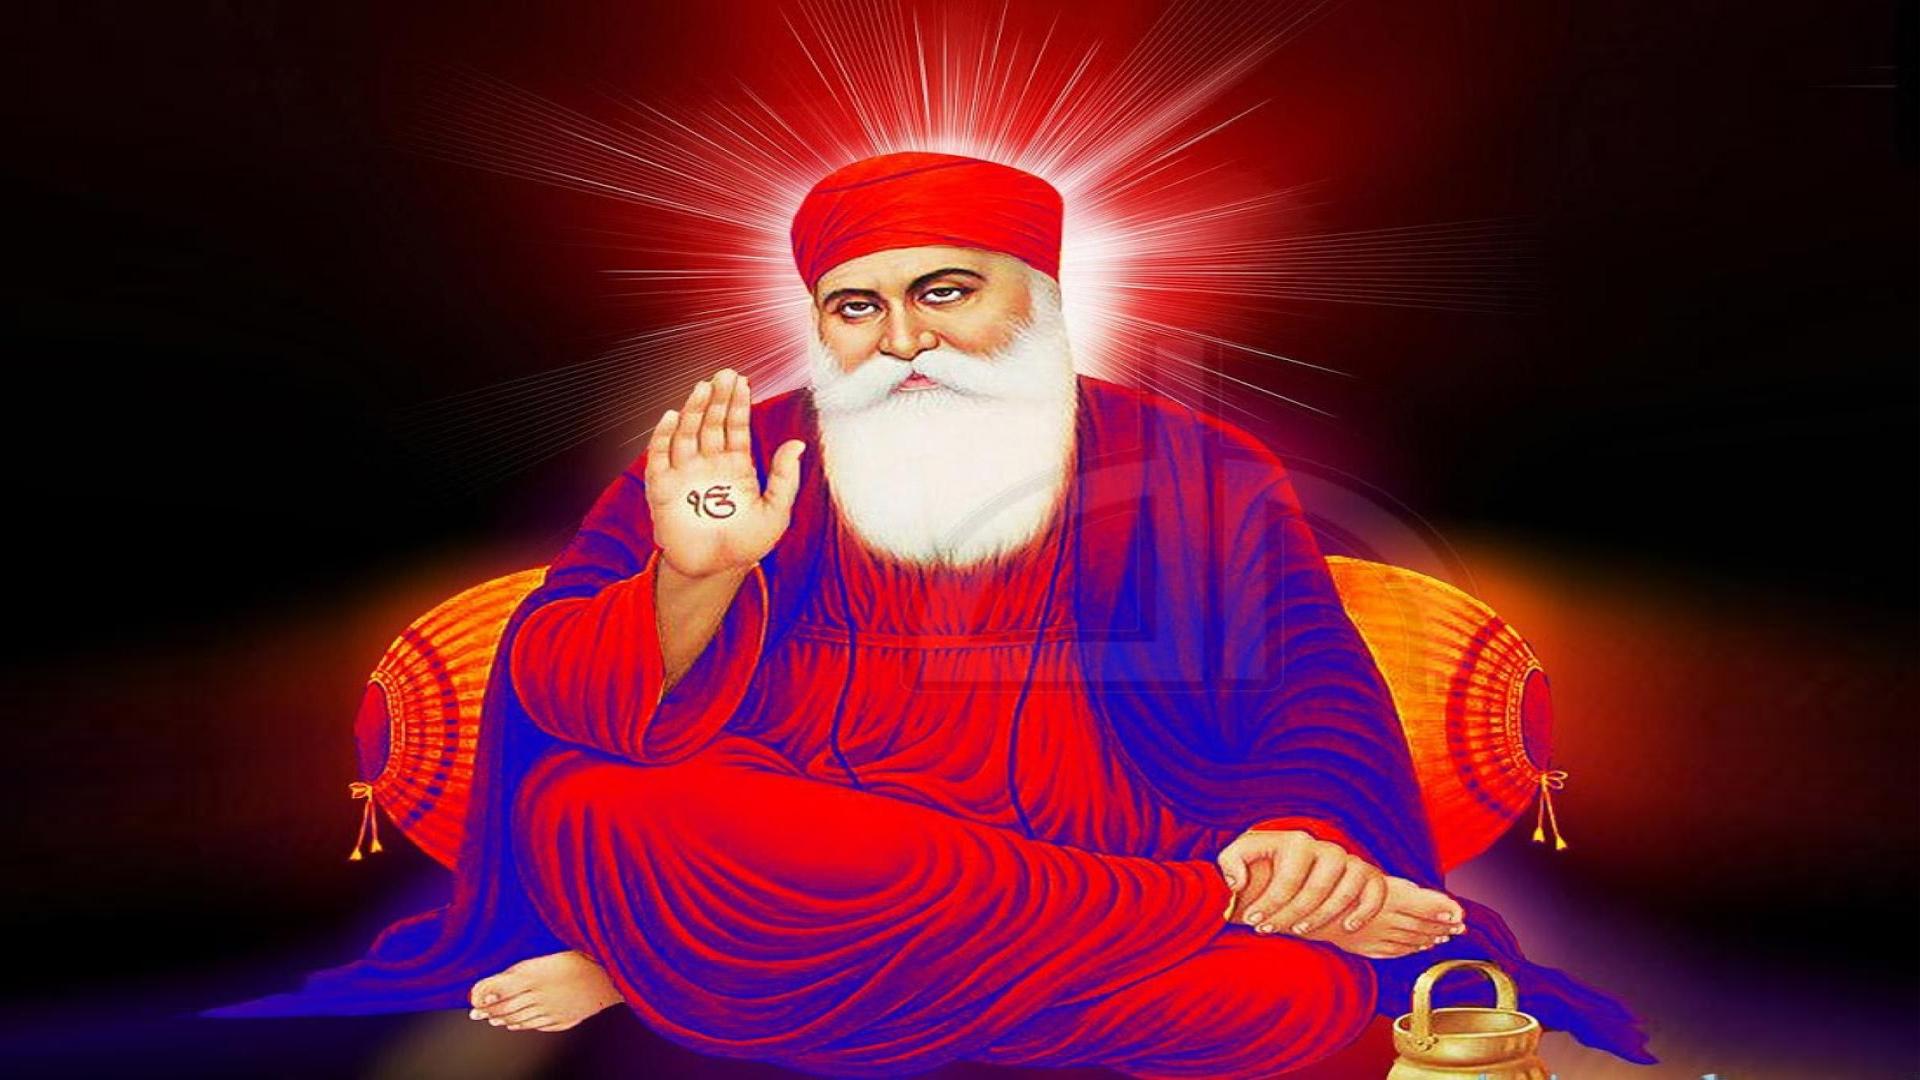 Guru Nanak Dev Images High Resolution